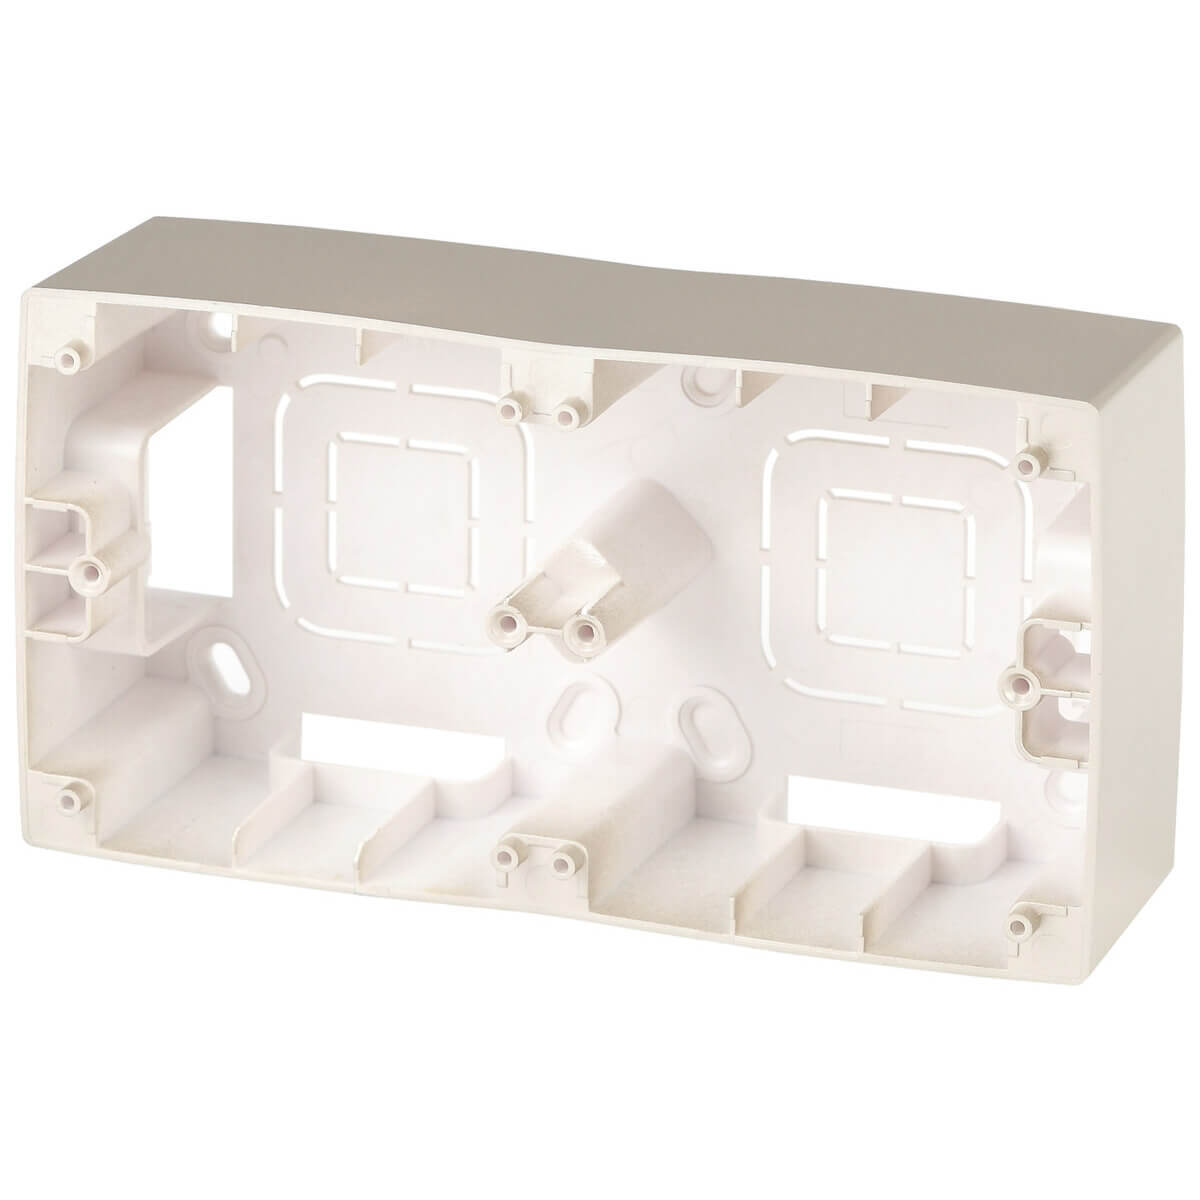 Монтажная коробка ЭРА 12-6102-04 Эра12